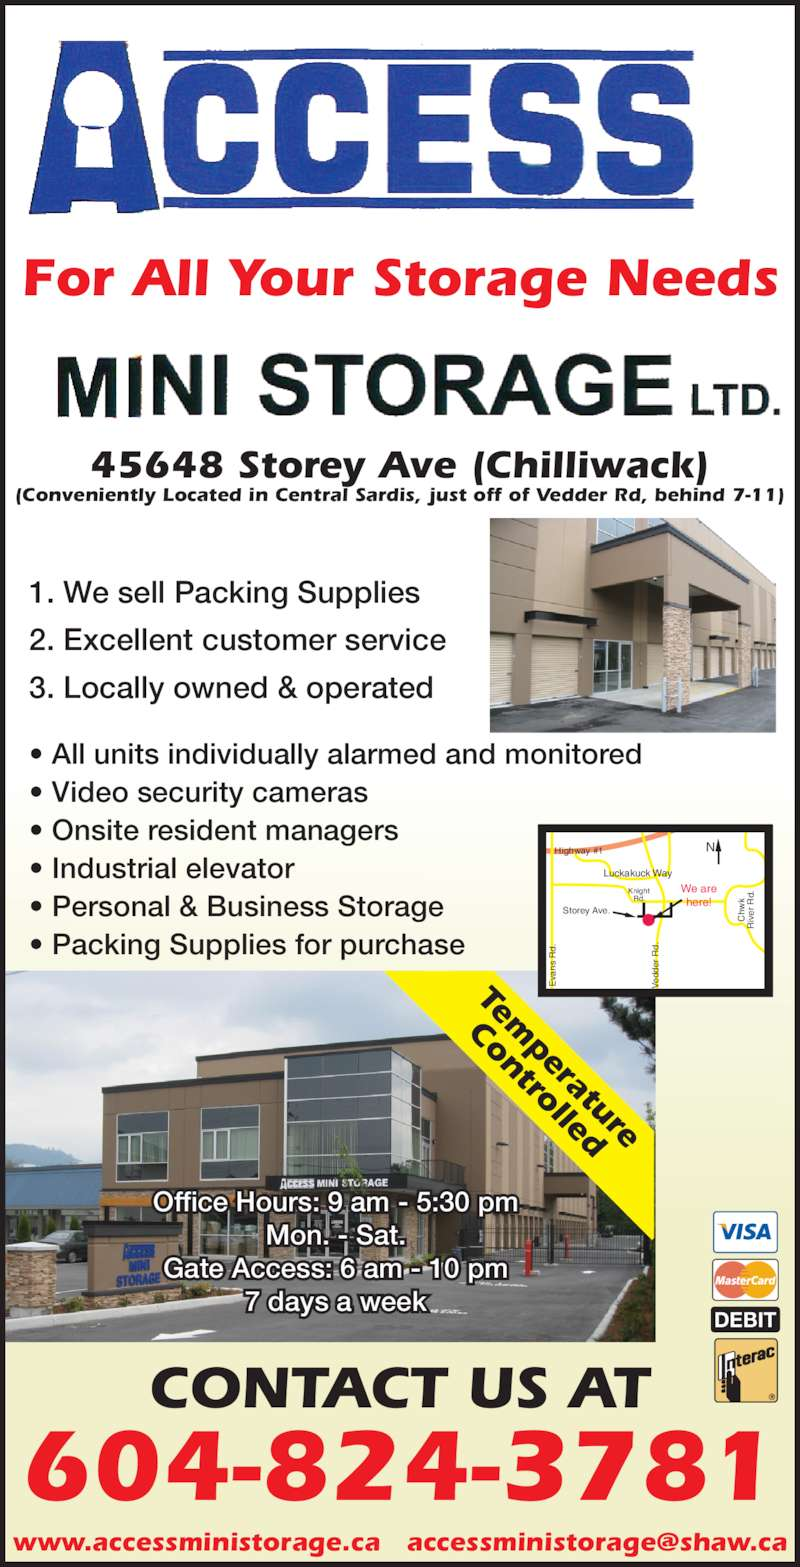 access mini storage ltd opening hours 45648 storey ave chilliwack bc. Black Bedroom Furniture Sets. Home Design Ideas